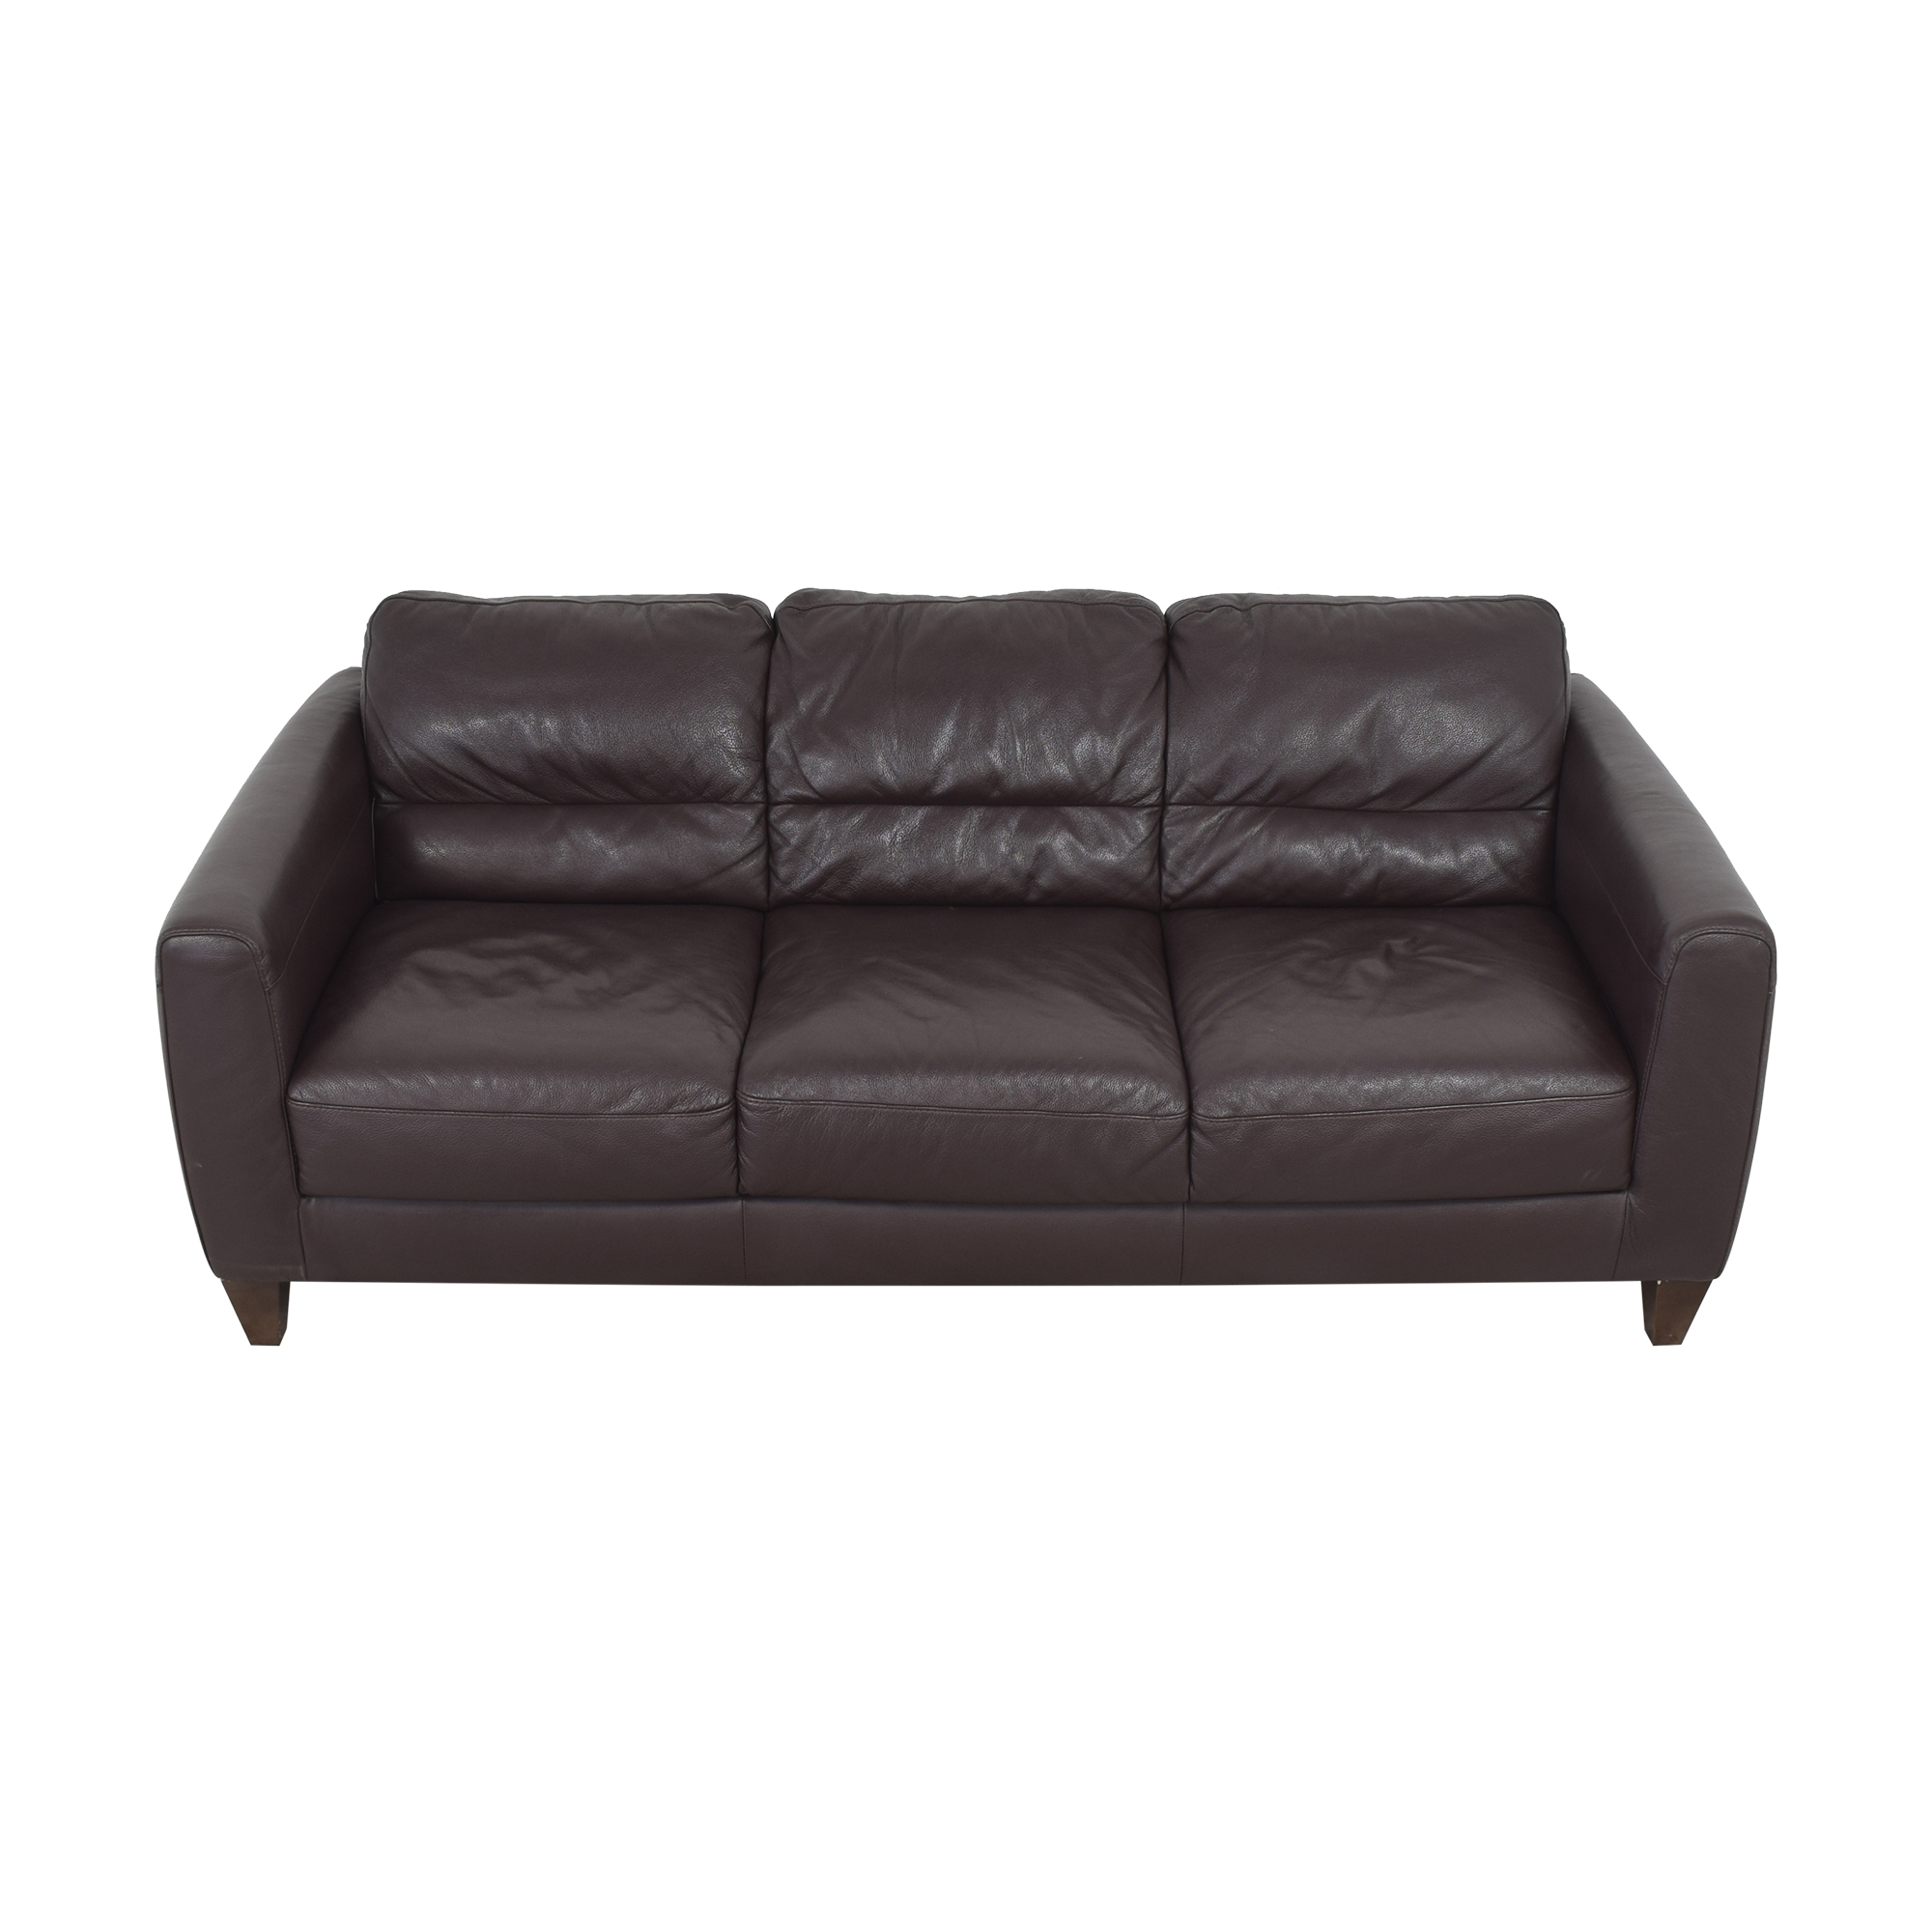 buy Natuzzi Three Cushion Sofa Natuzzi Sofas